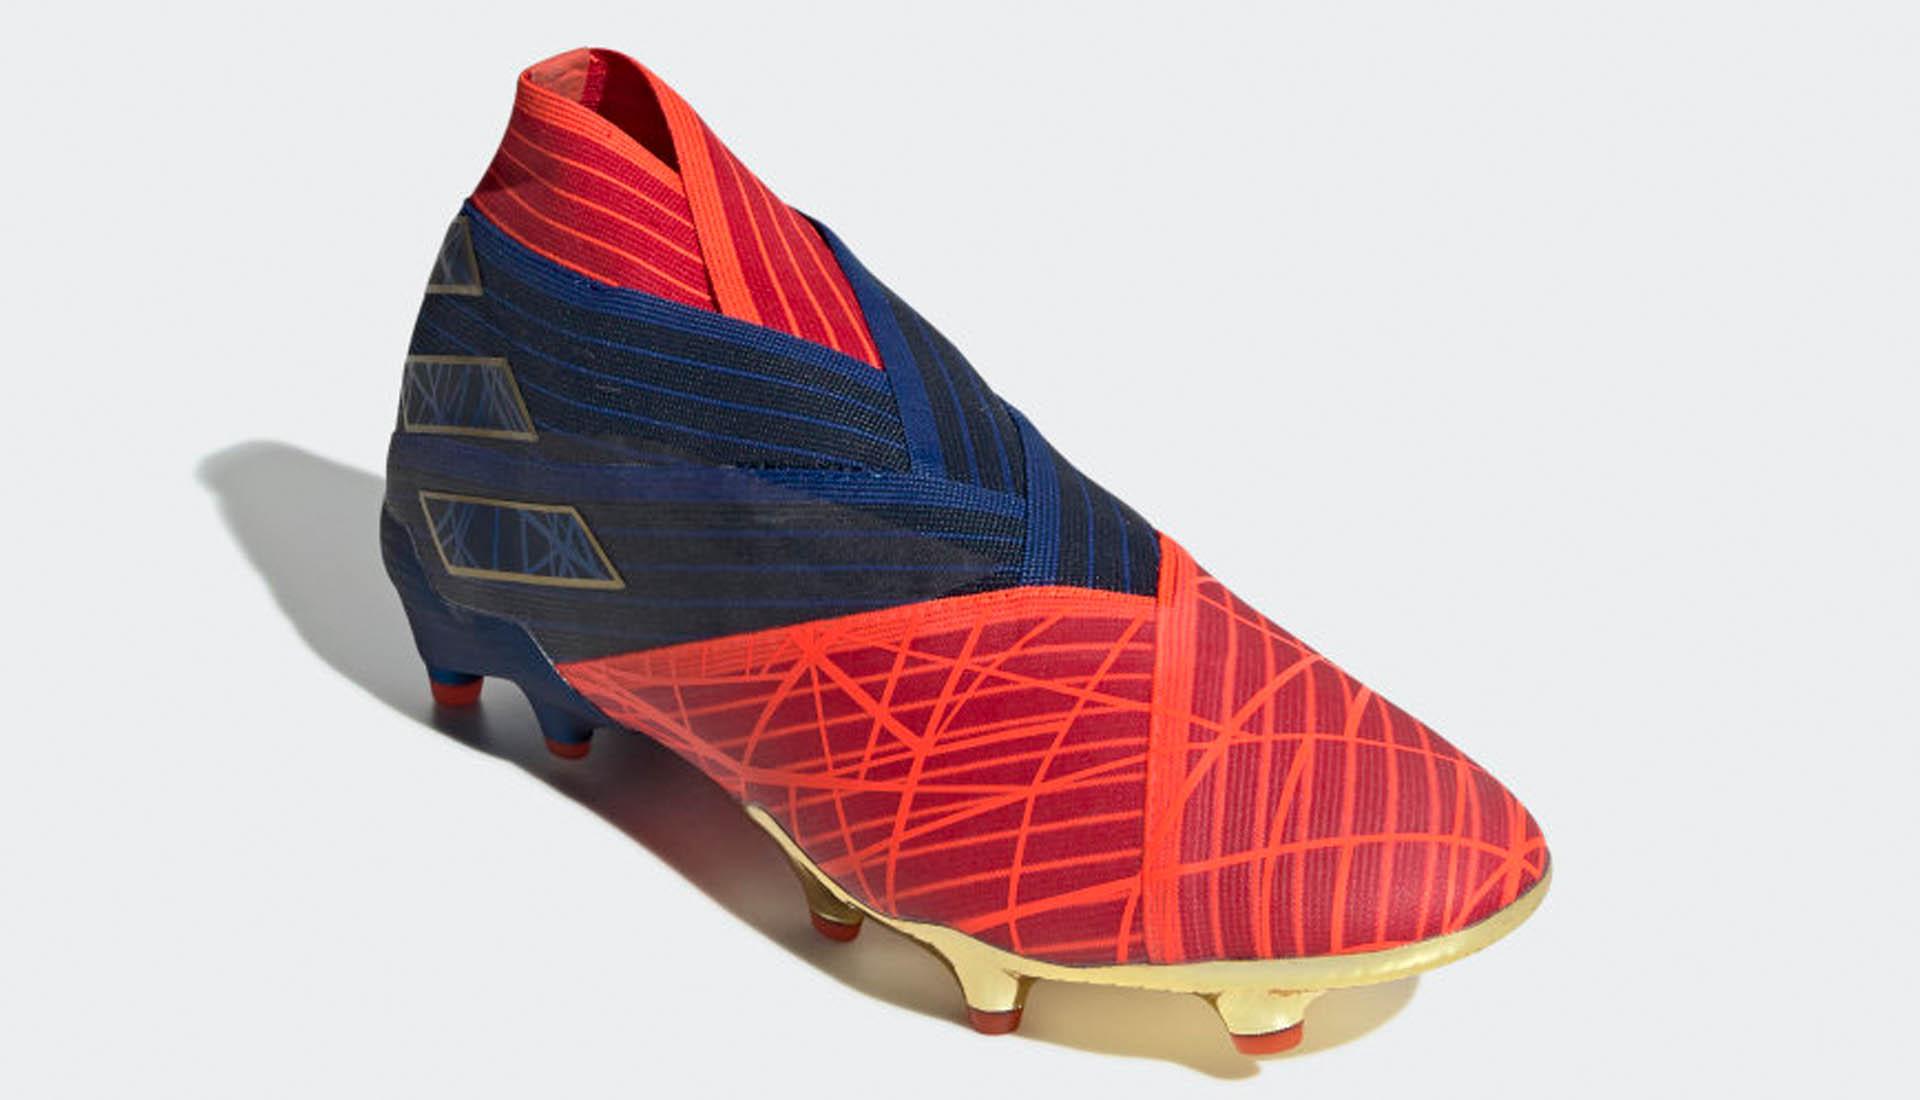 Spiderman Football Boot UNBOXING Adidas Nemeziz 19+ Marvel Edition